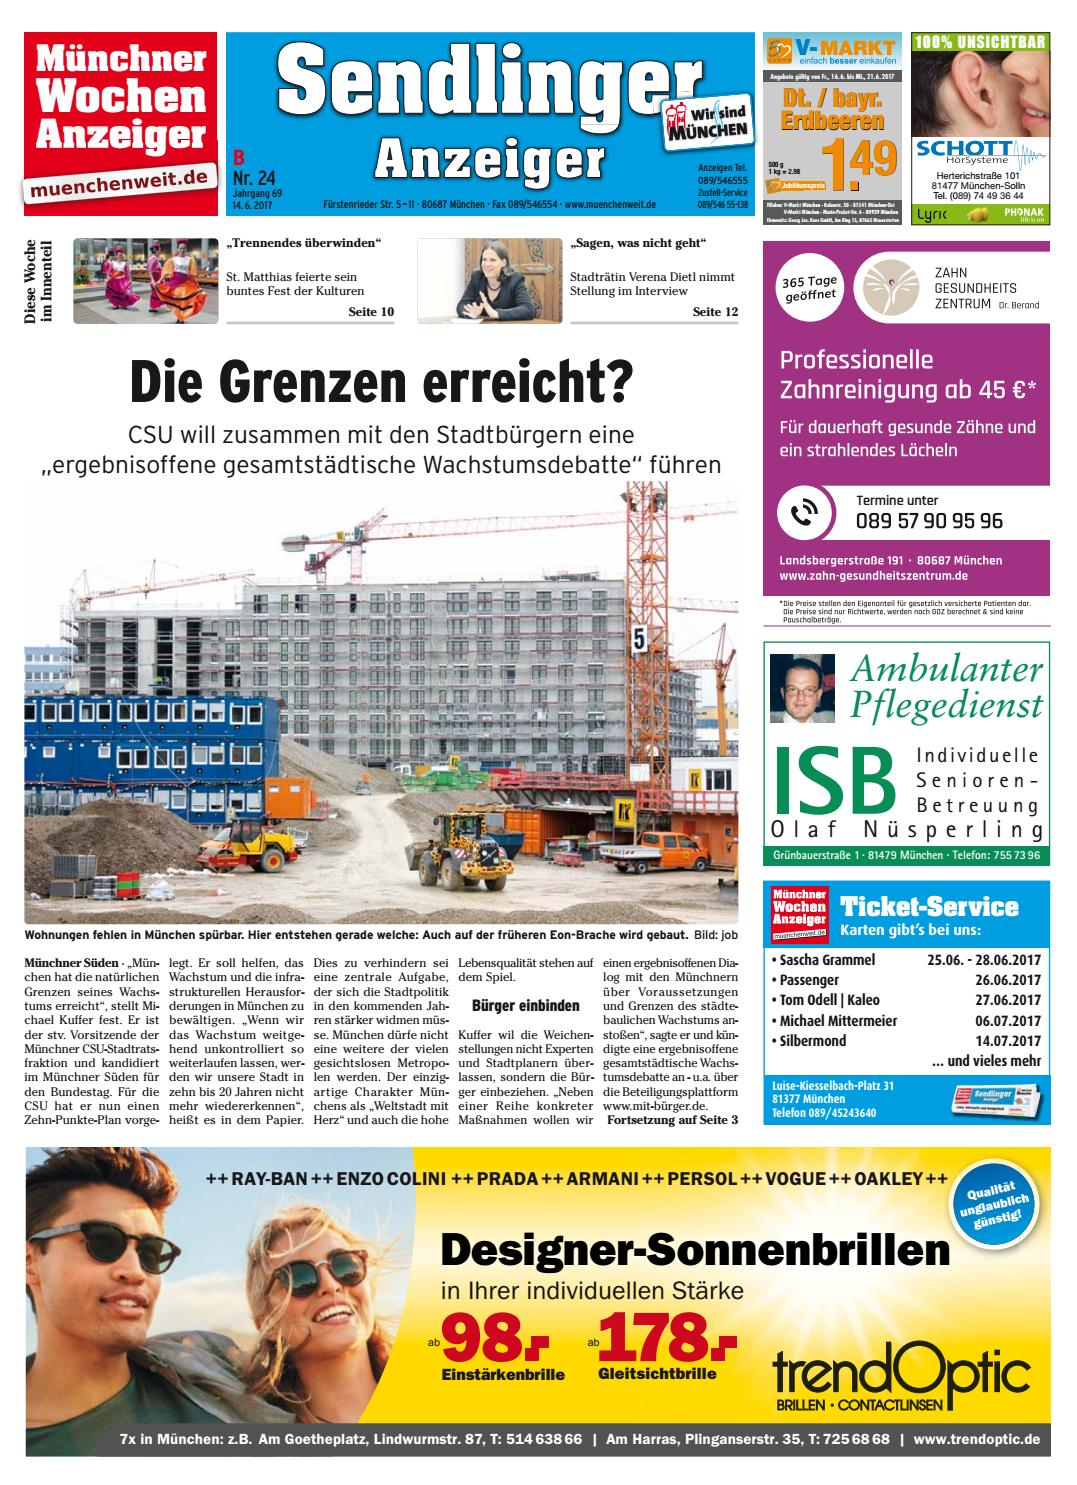 4a79246909f16 KW 24-2017 by Wochenanzeiger Medien GmbH - issuu